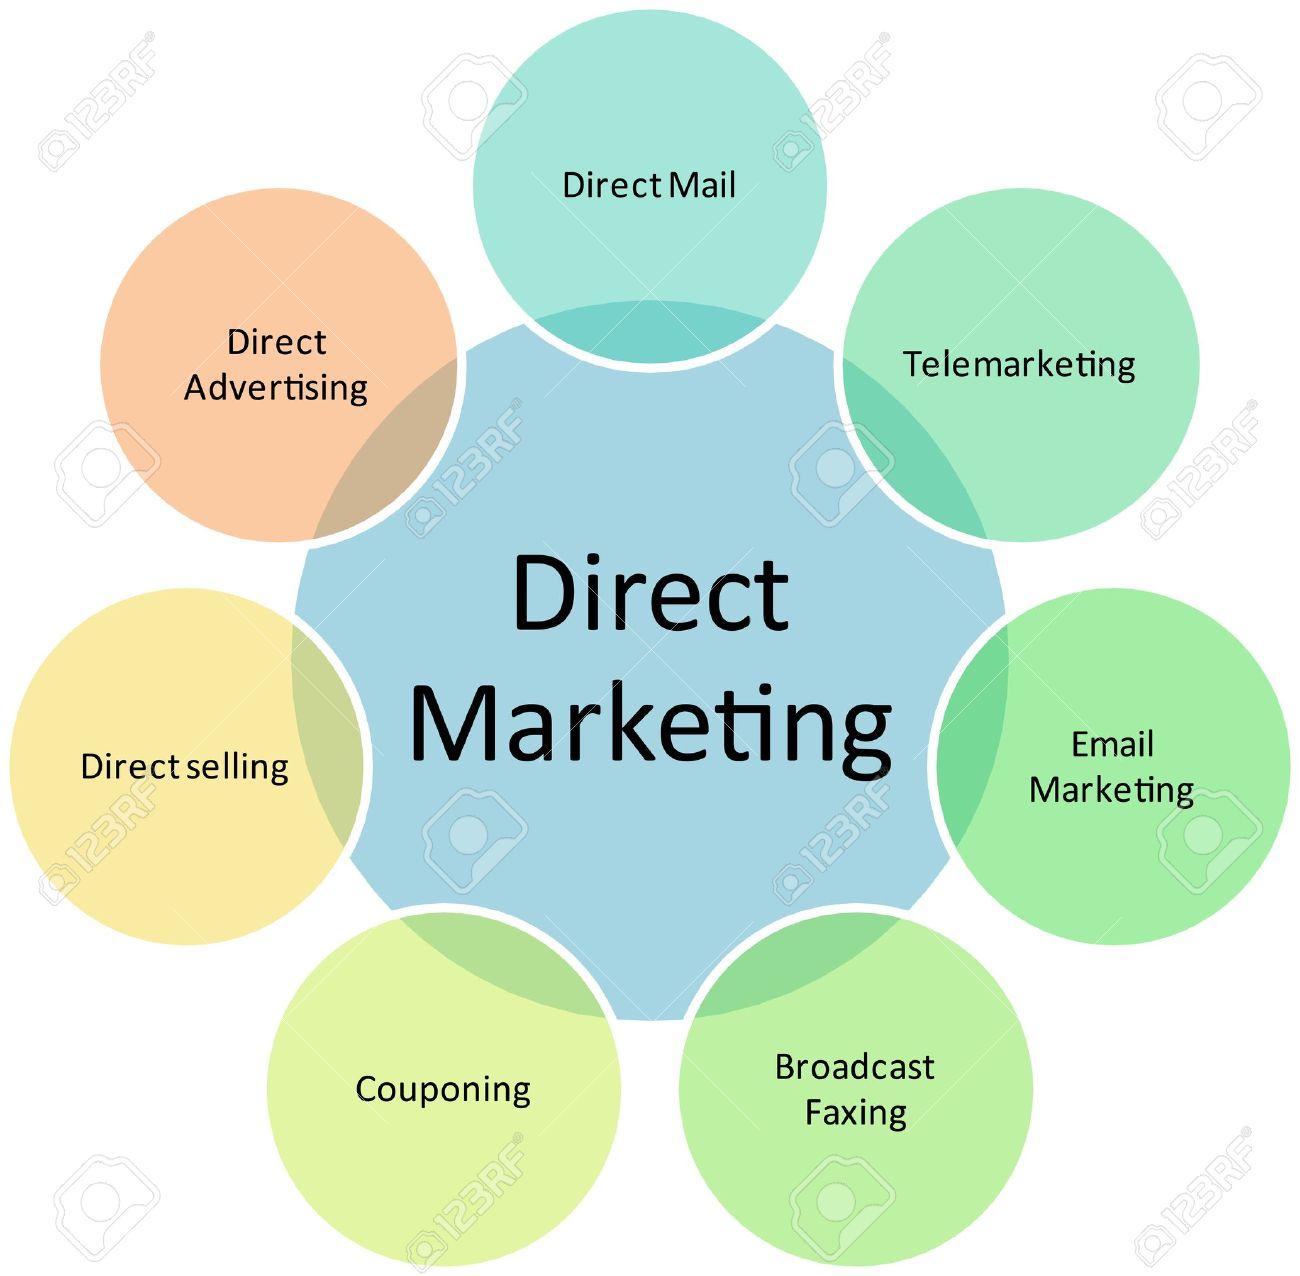 direct marketing business diagram management strategy chart    illustration   direct marketing business diagram management strategy chart illustration